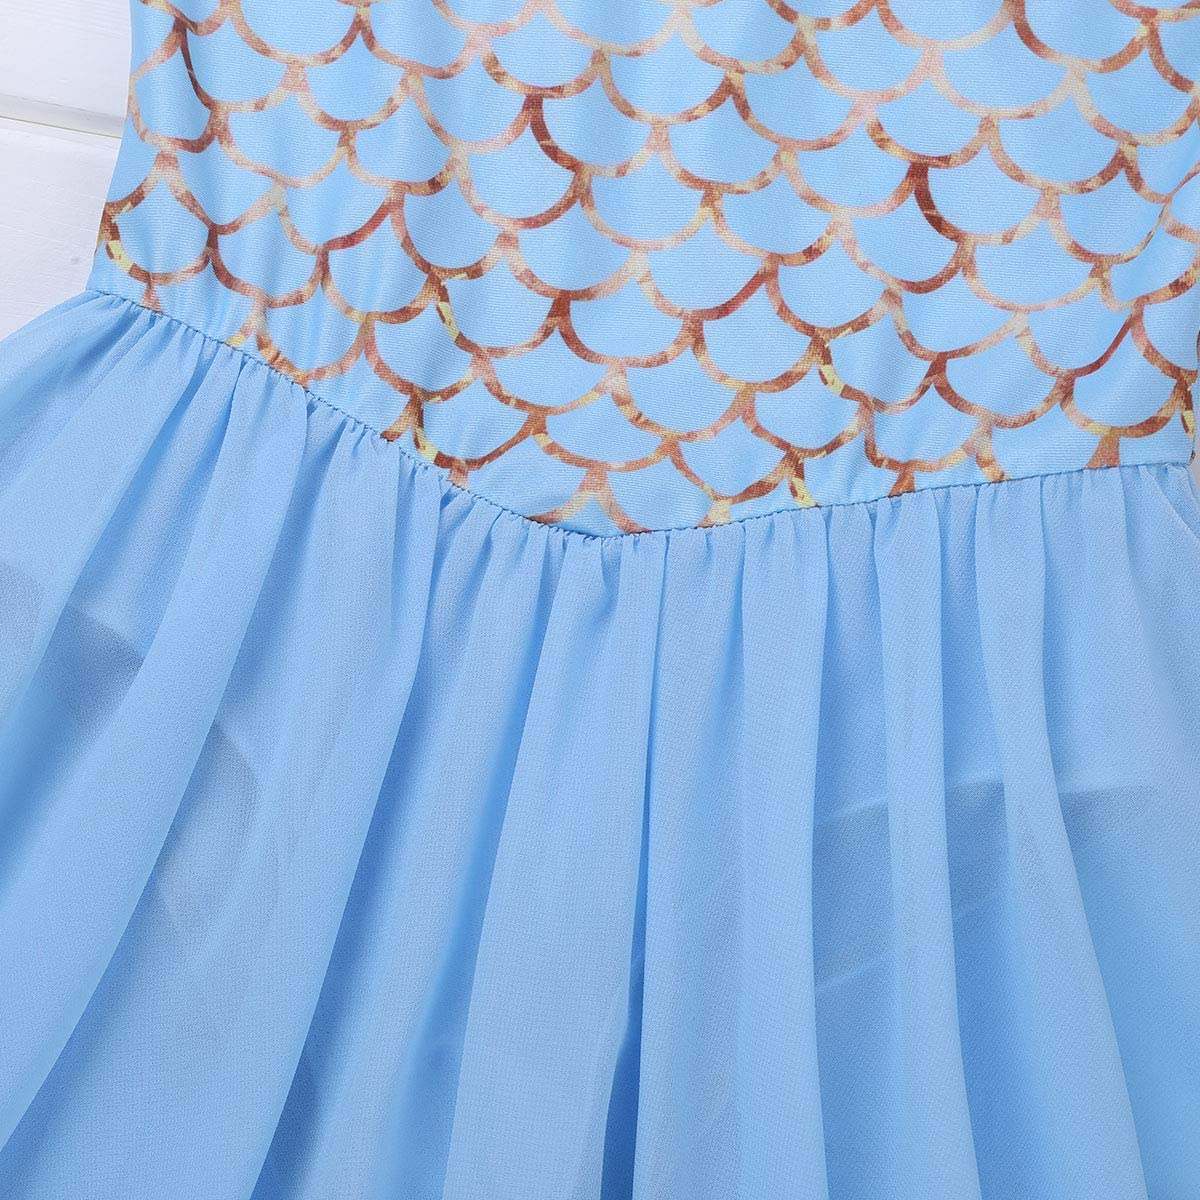 dPois Kids Girls Sequined Mermaid Leotard Dress Ballet Dance Gymnastics Tutu Princess Fancy Party Dancing Costumes